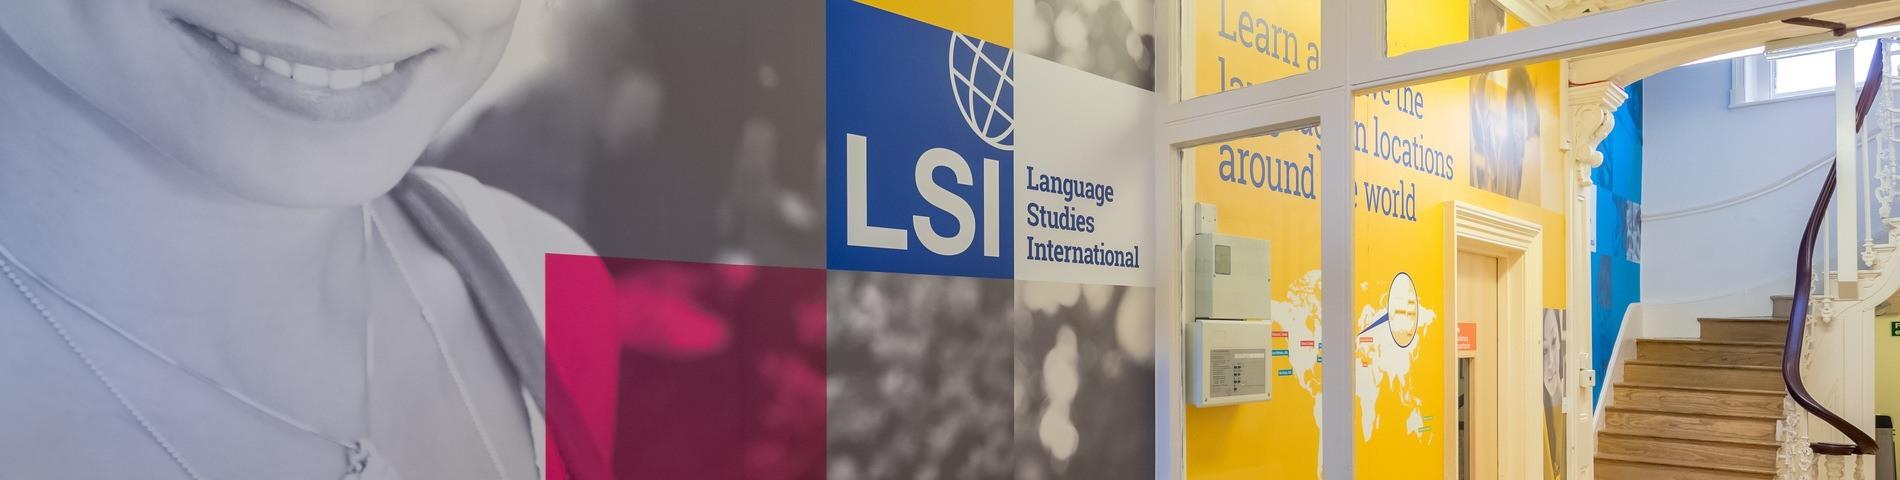 LSI - Language Studies International - Hampstead صورة 1